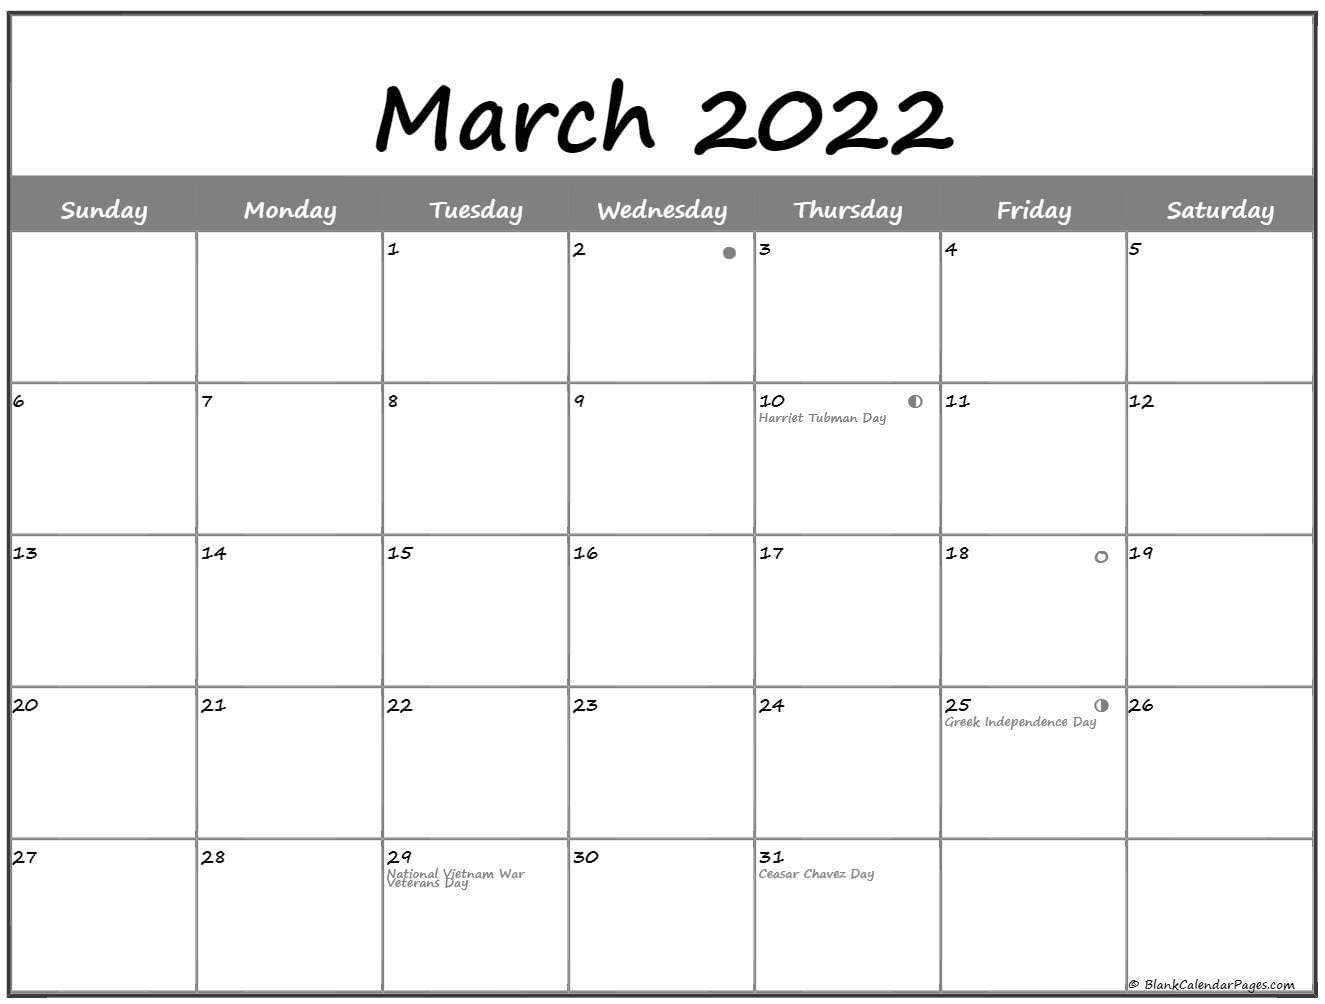 March 2022 Lunar Calendar | Moon Phase Calendar Intended For February March 2022 Calendar